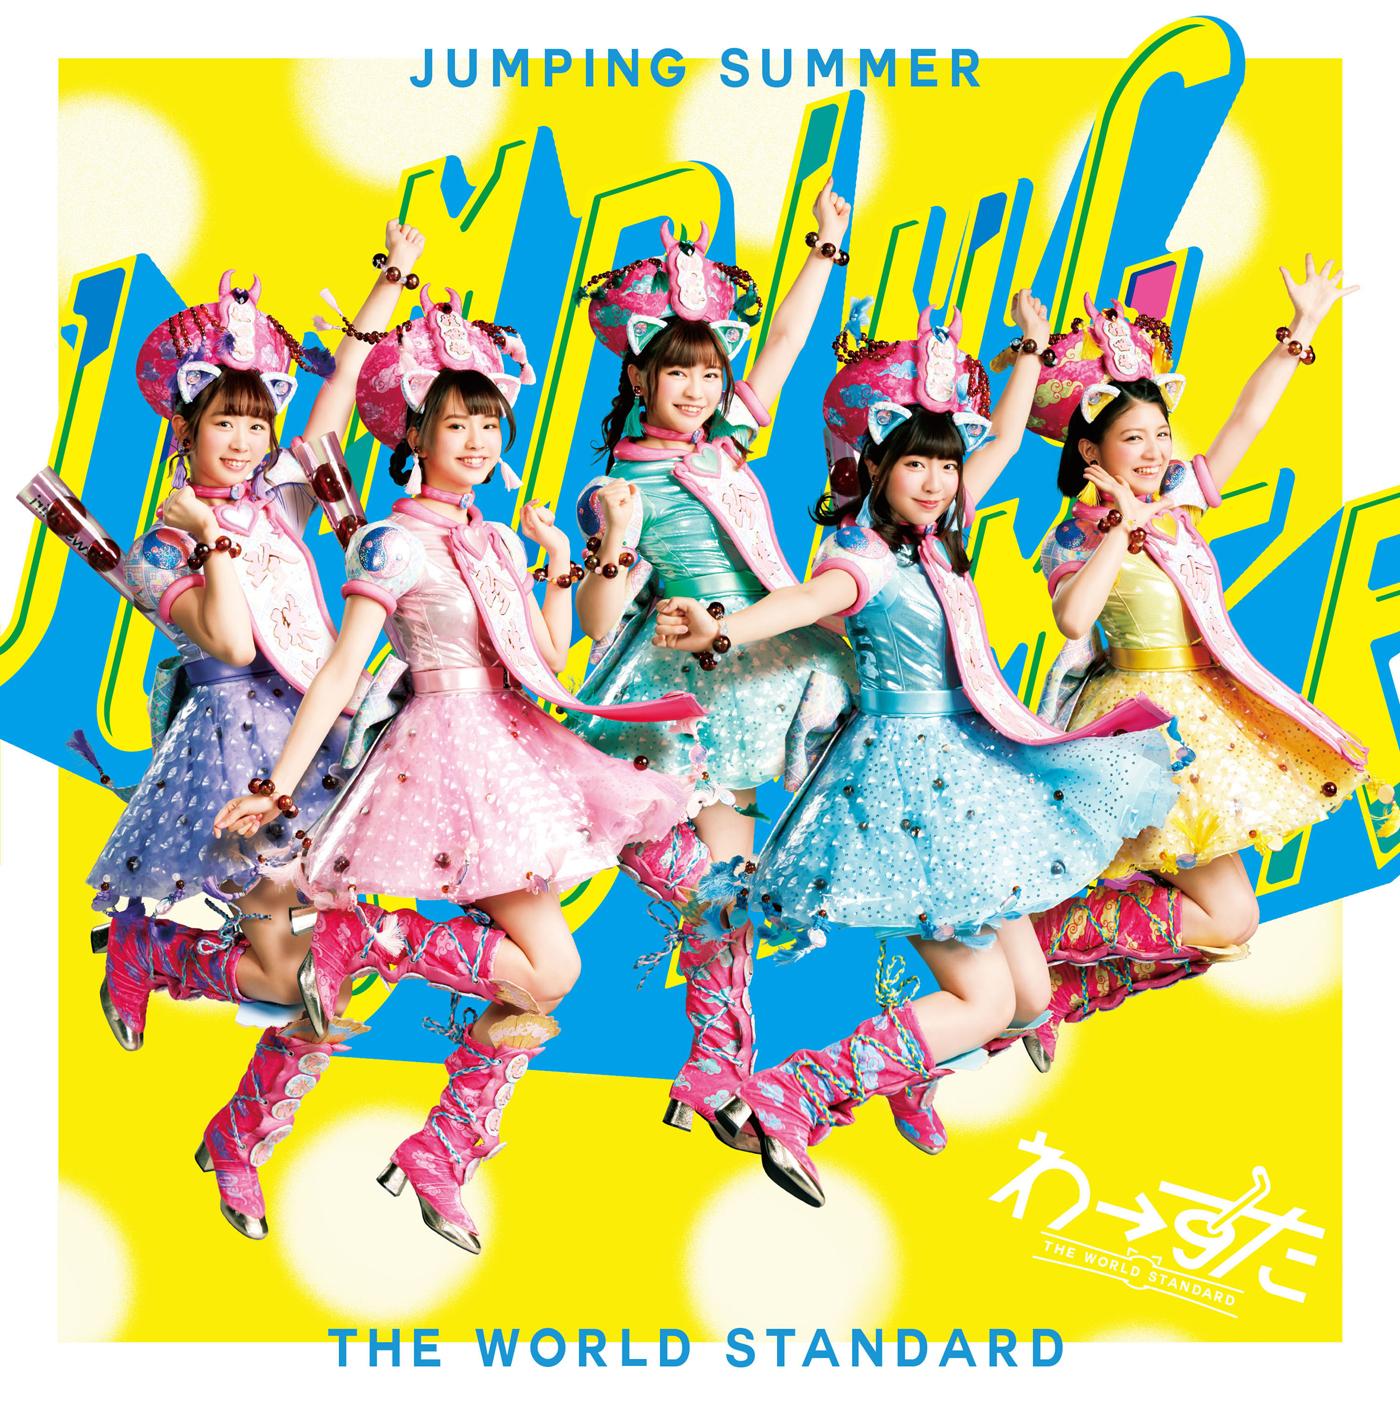 20180626.1612.08 The World Standard - Jumping Summer (FLAC) cover.jpg